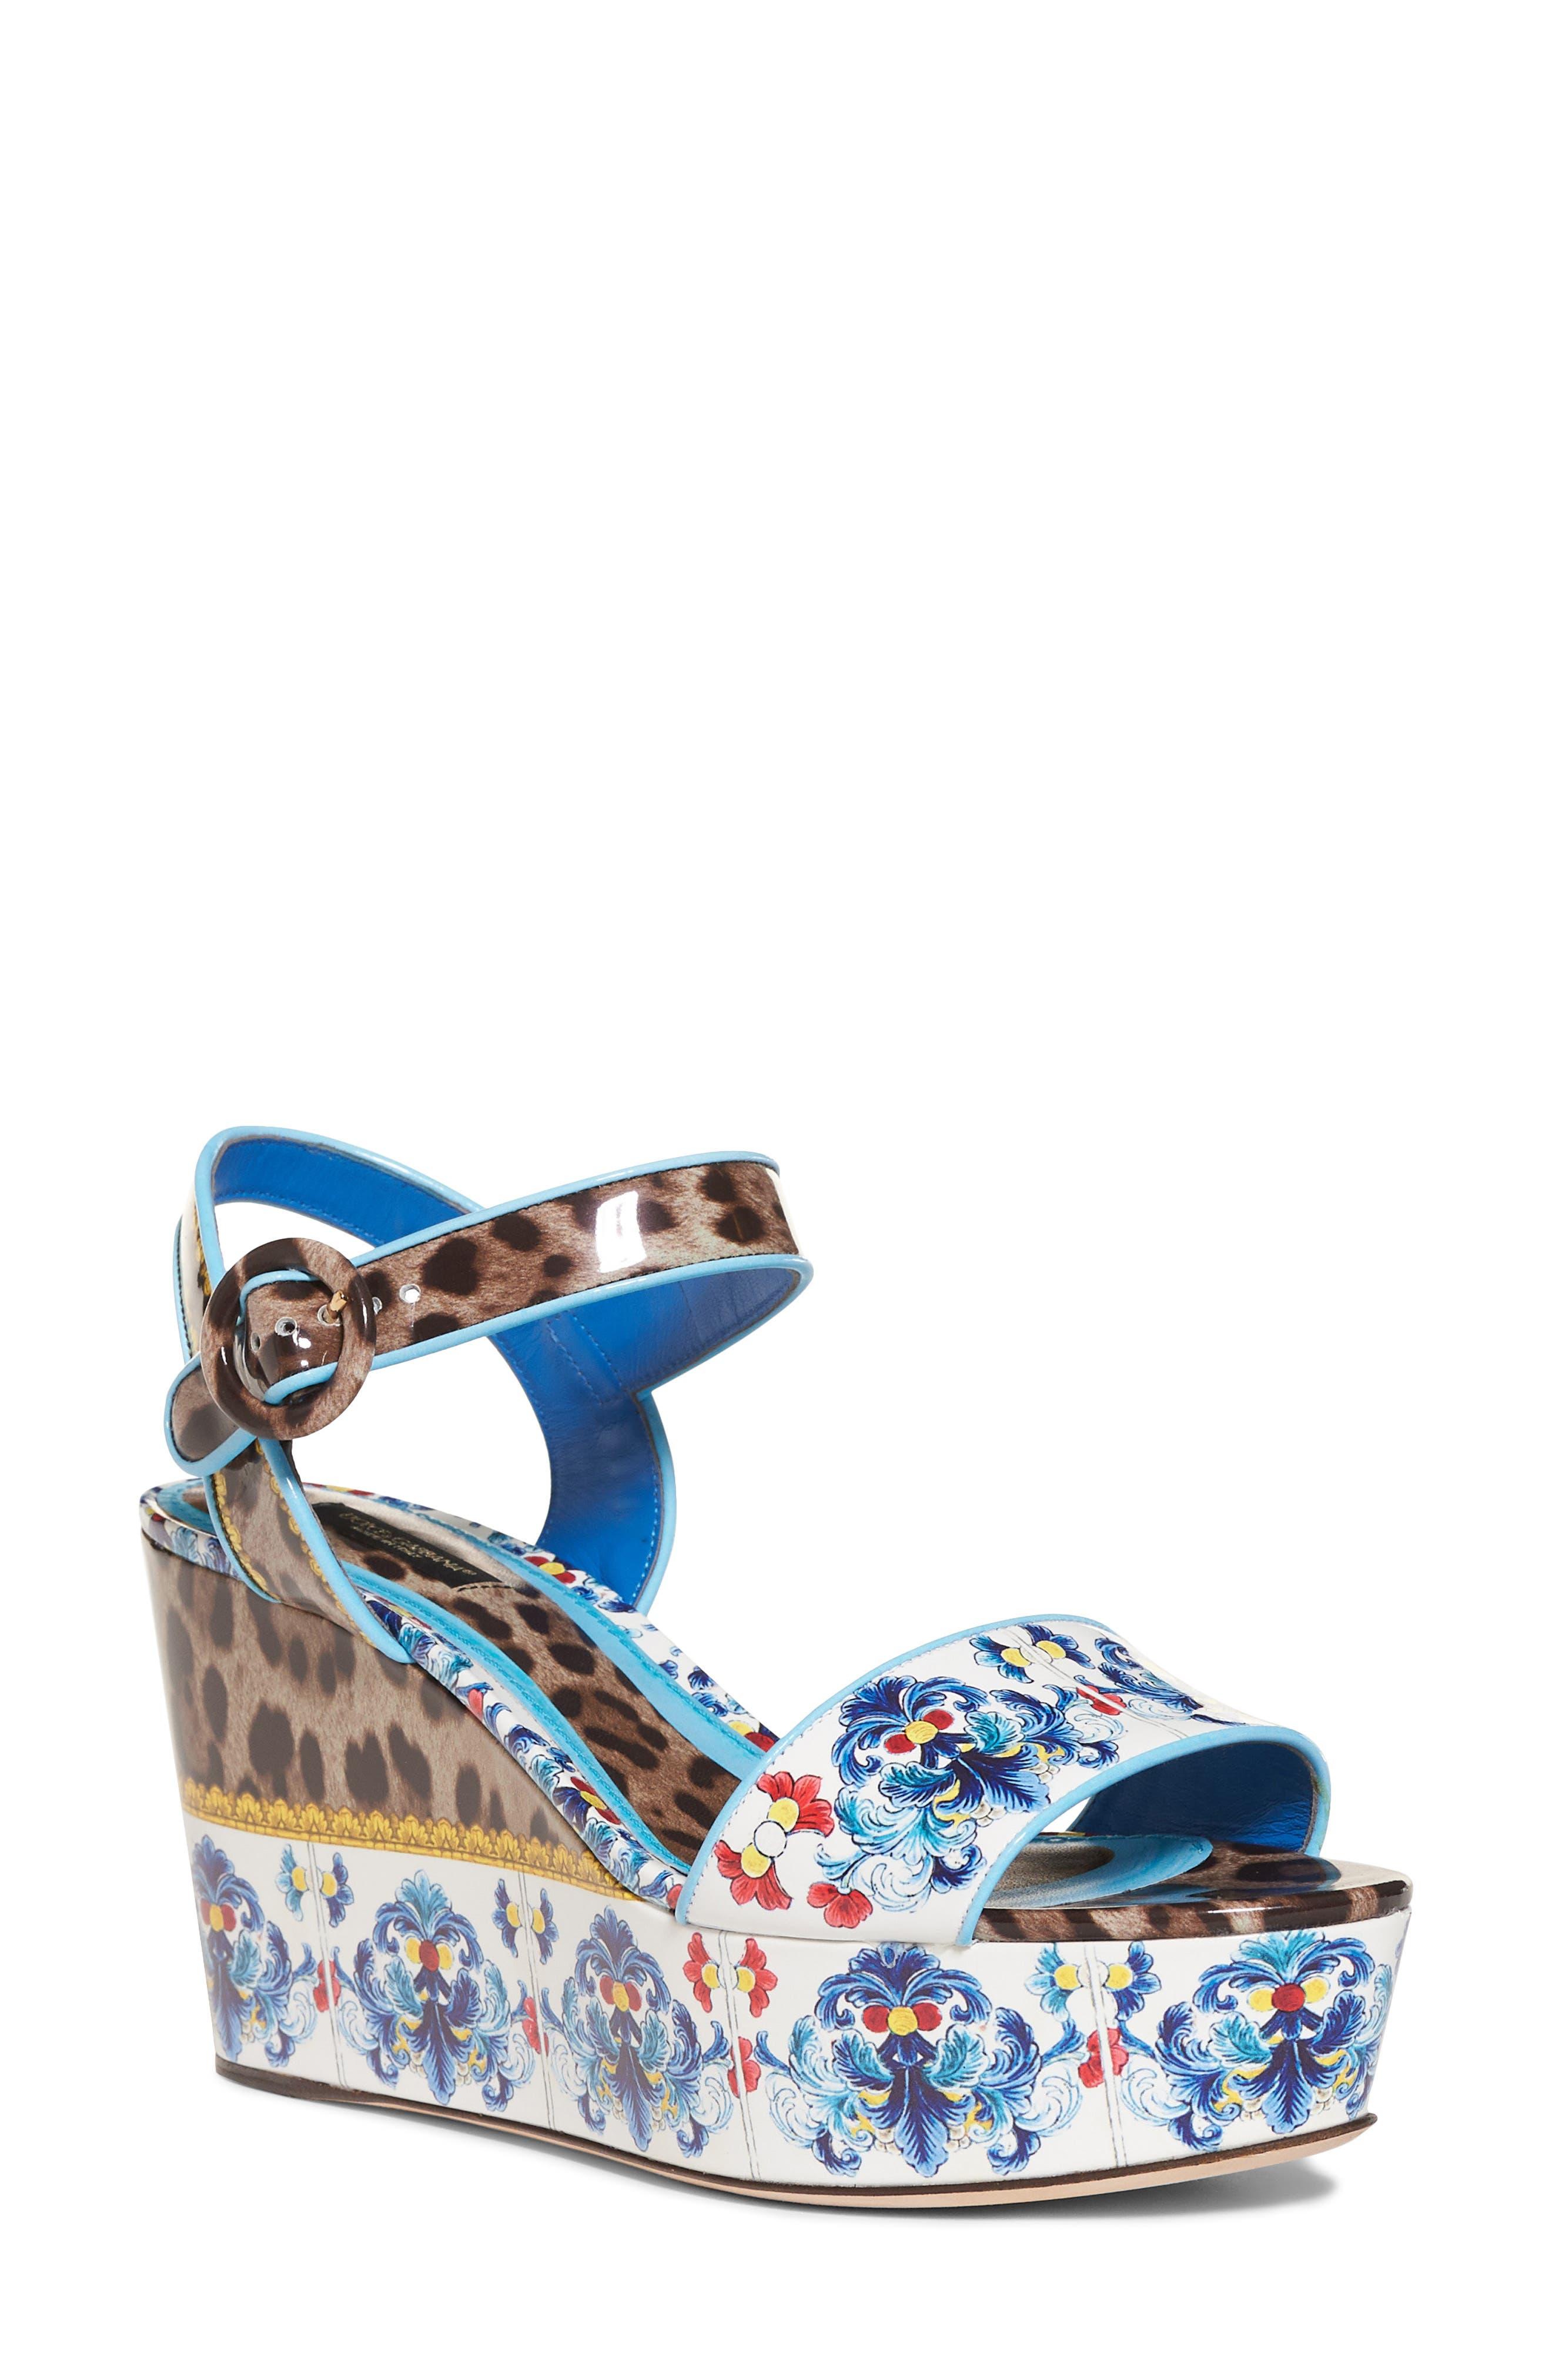 Dolce&Gabbana Majolica & Leopard Print Flatform Sandal (Women)